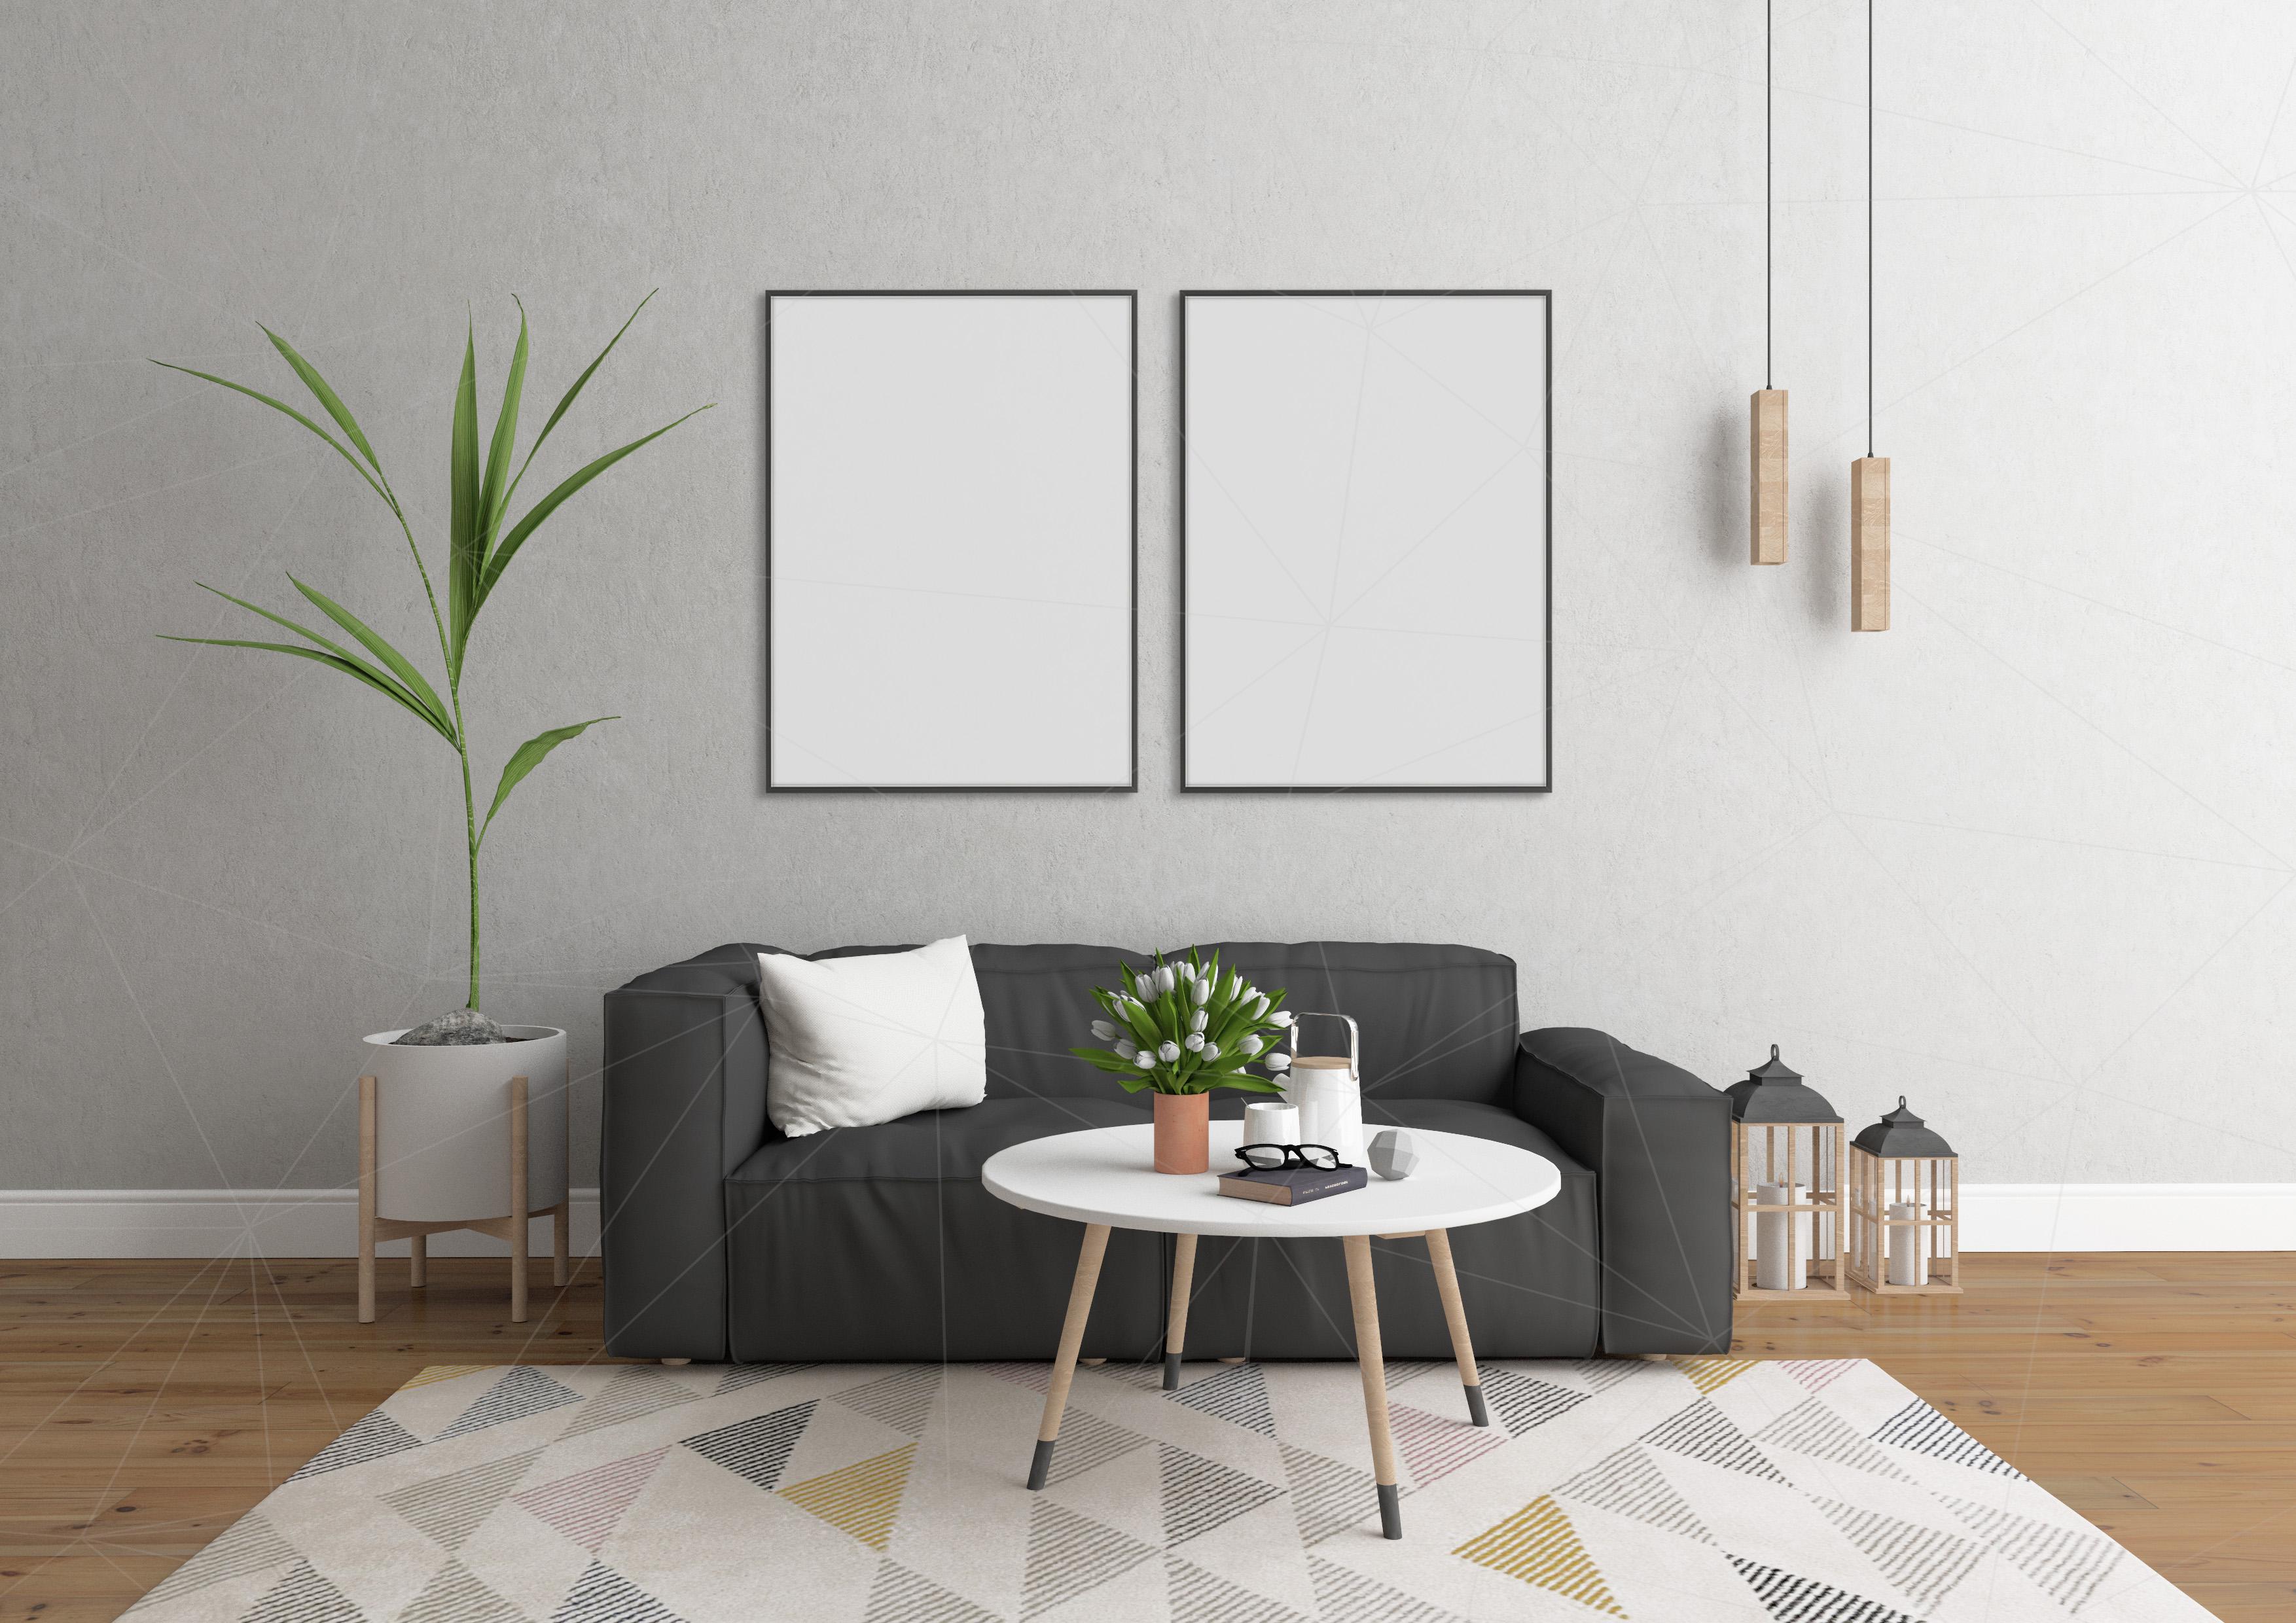 Interior mockup bundle - blank wall mock up